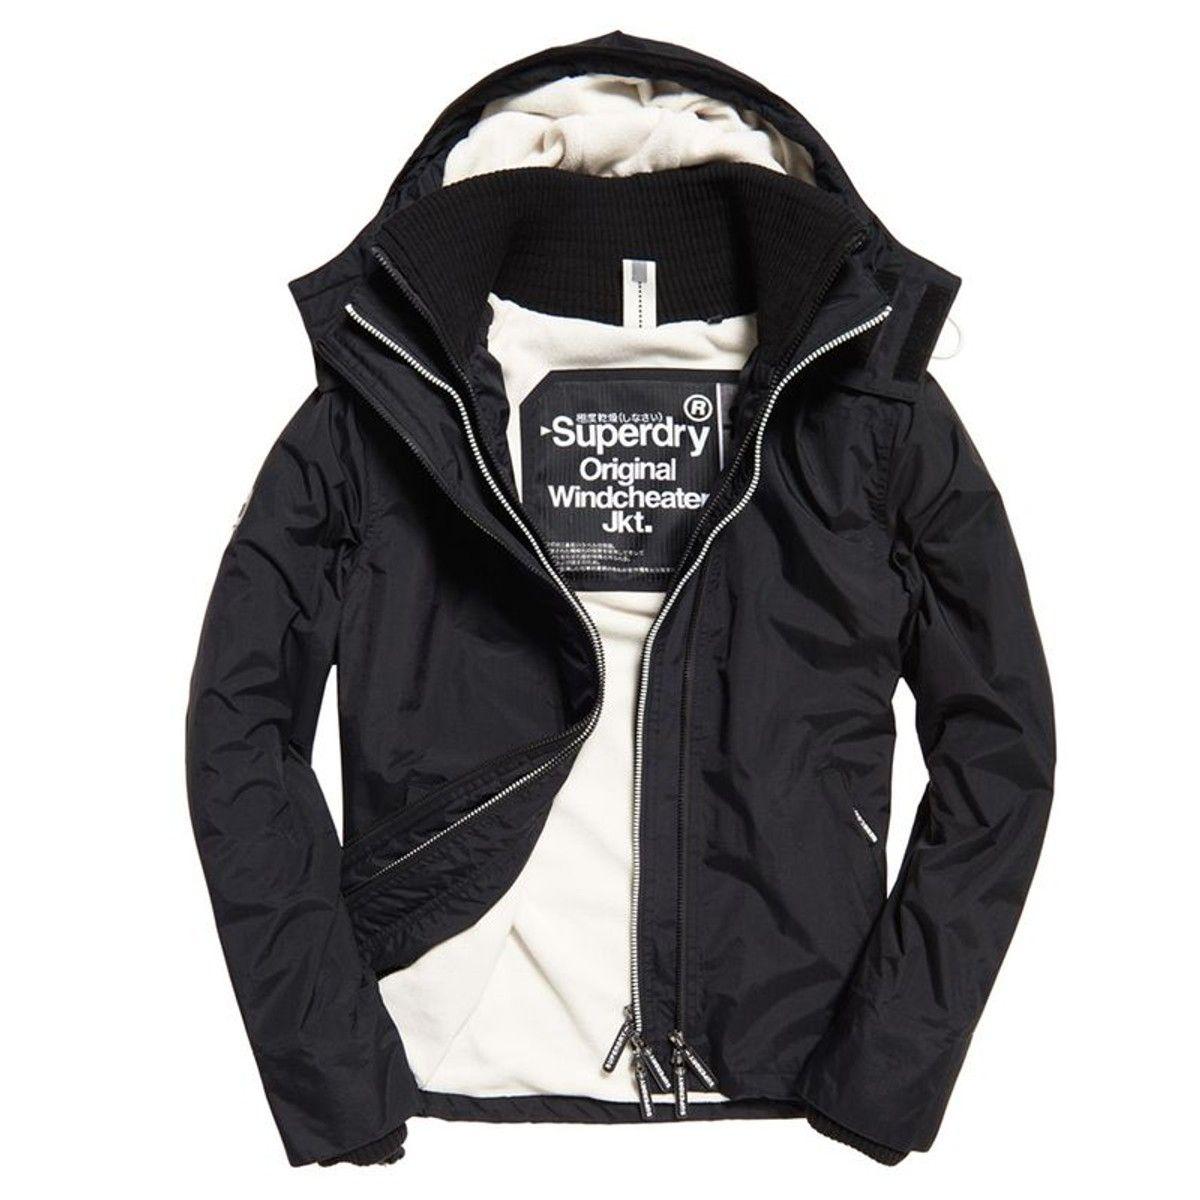 Pin by Guillermo on I want it   Windbreaker jacket mens